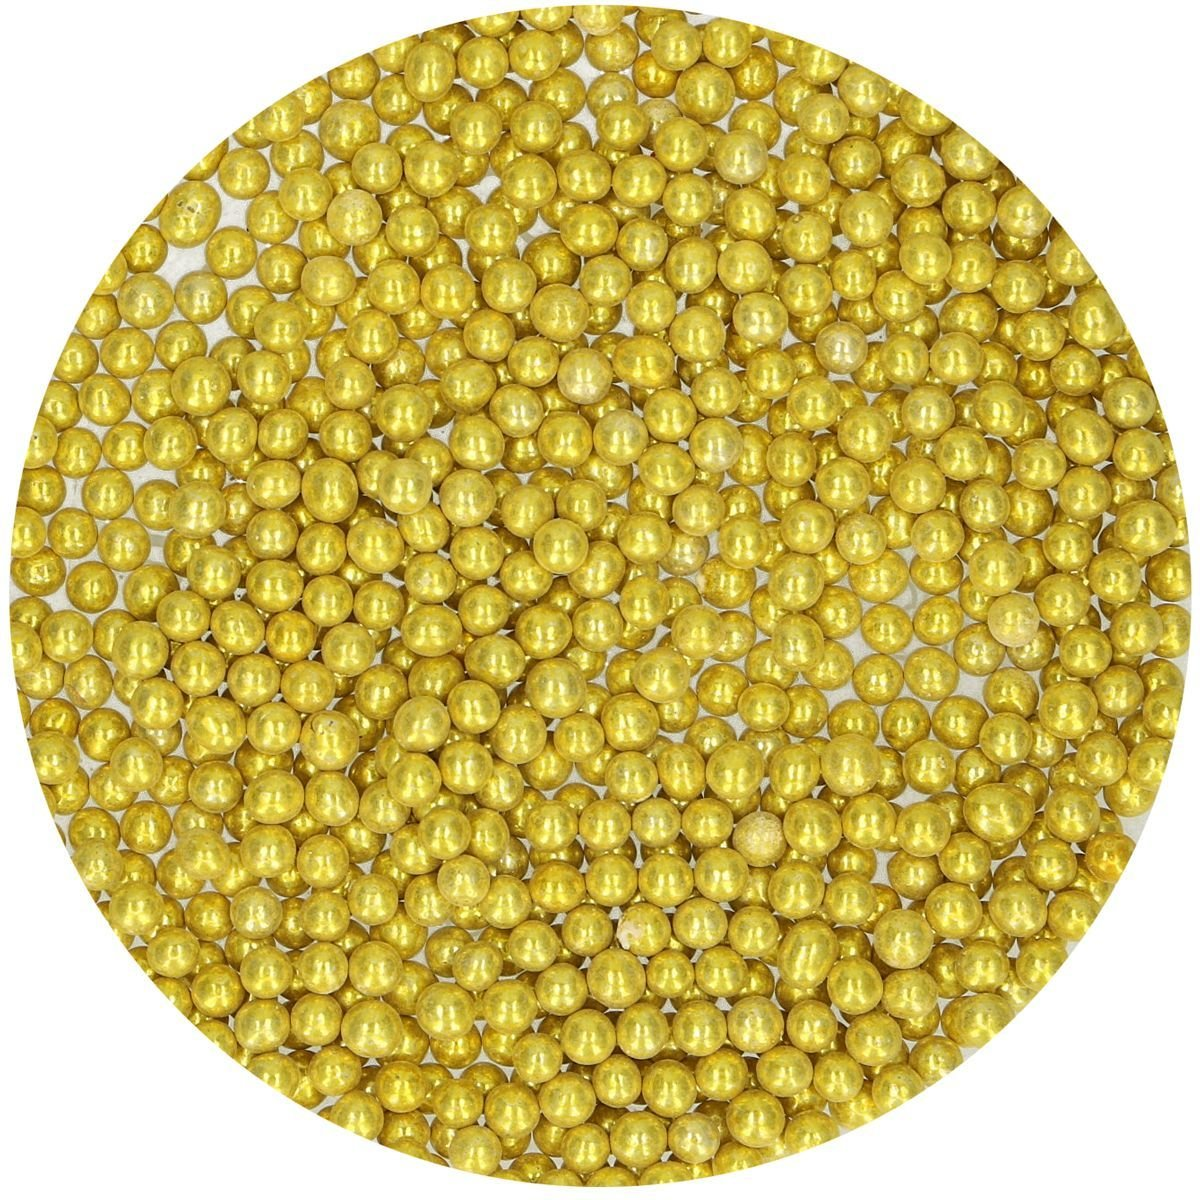 FunCakes Sugarballs -4mm METALLIC GOLD 80g - Ζαχαρωτά Χρυσές Μεταλλικές Μπιλίτσες/Πέρλες